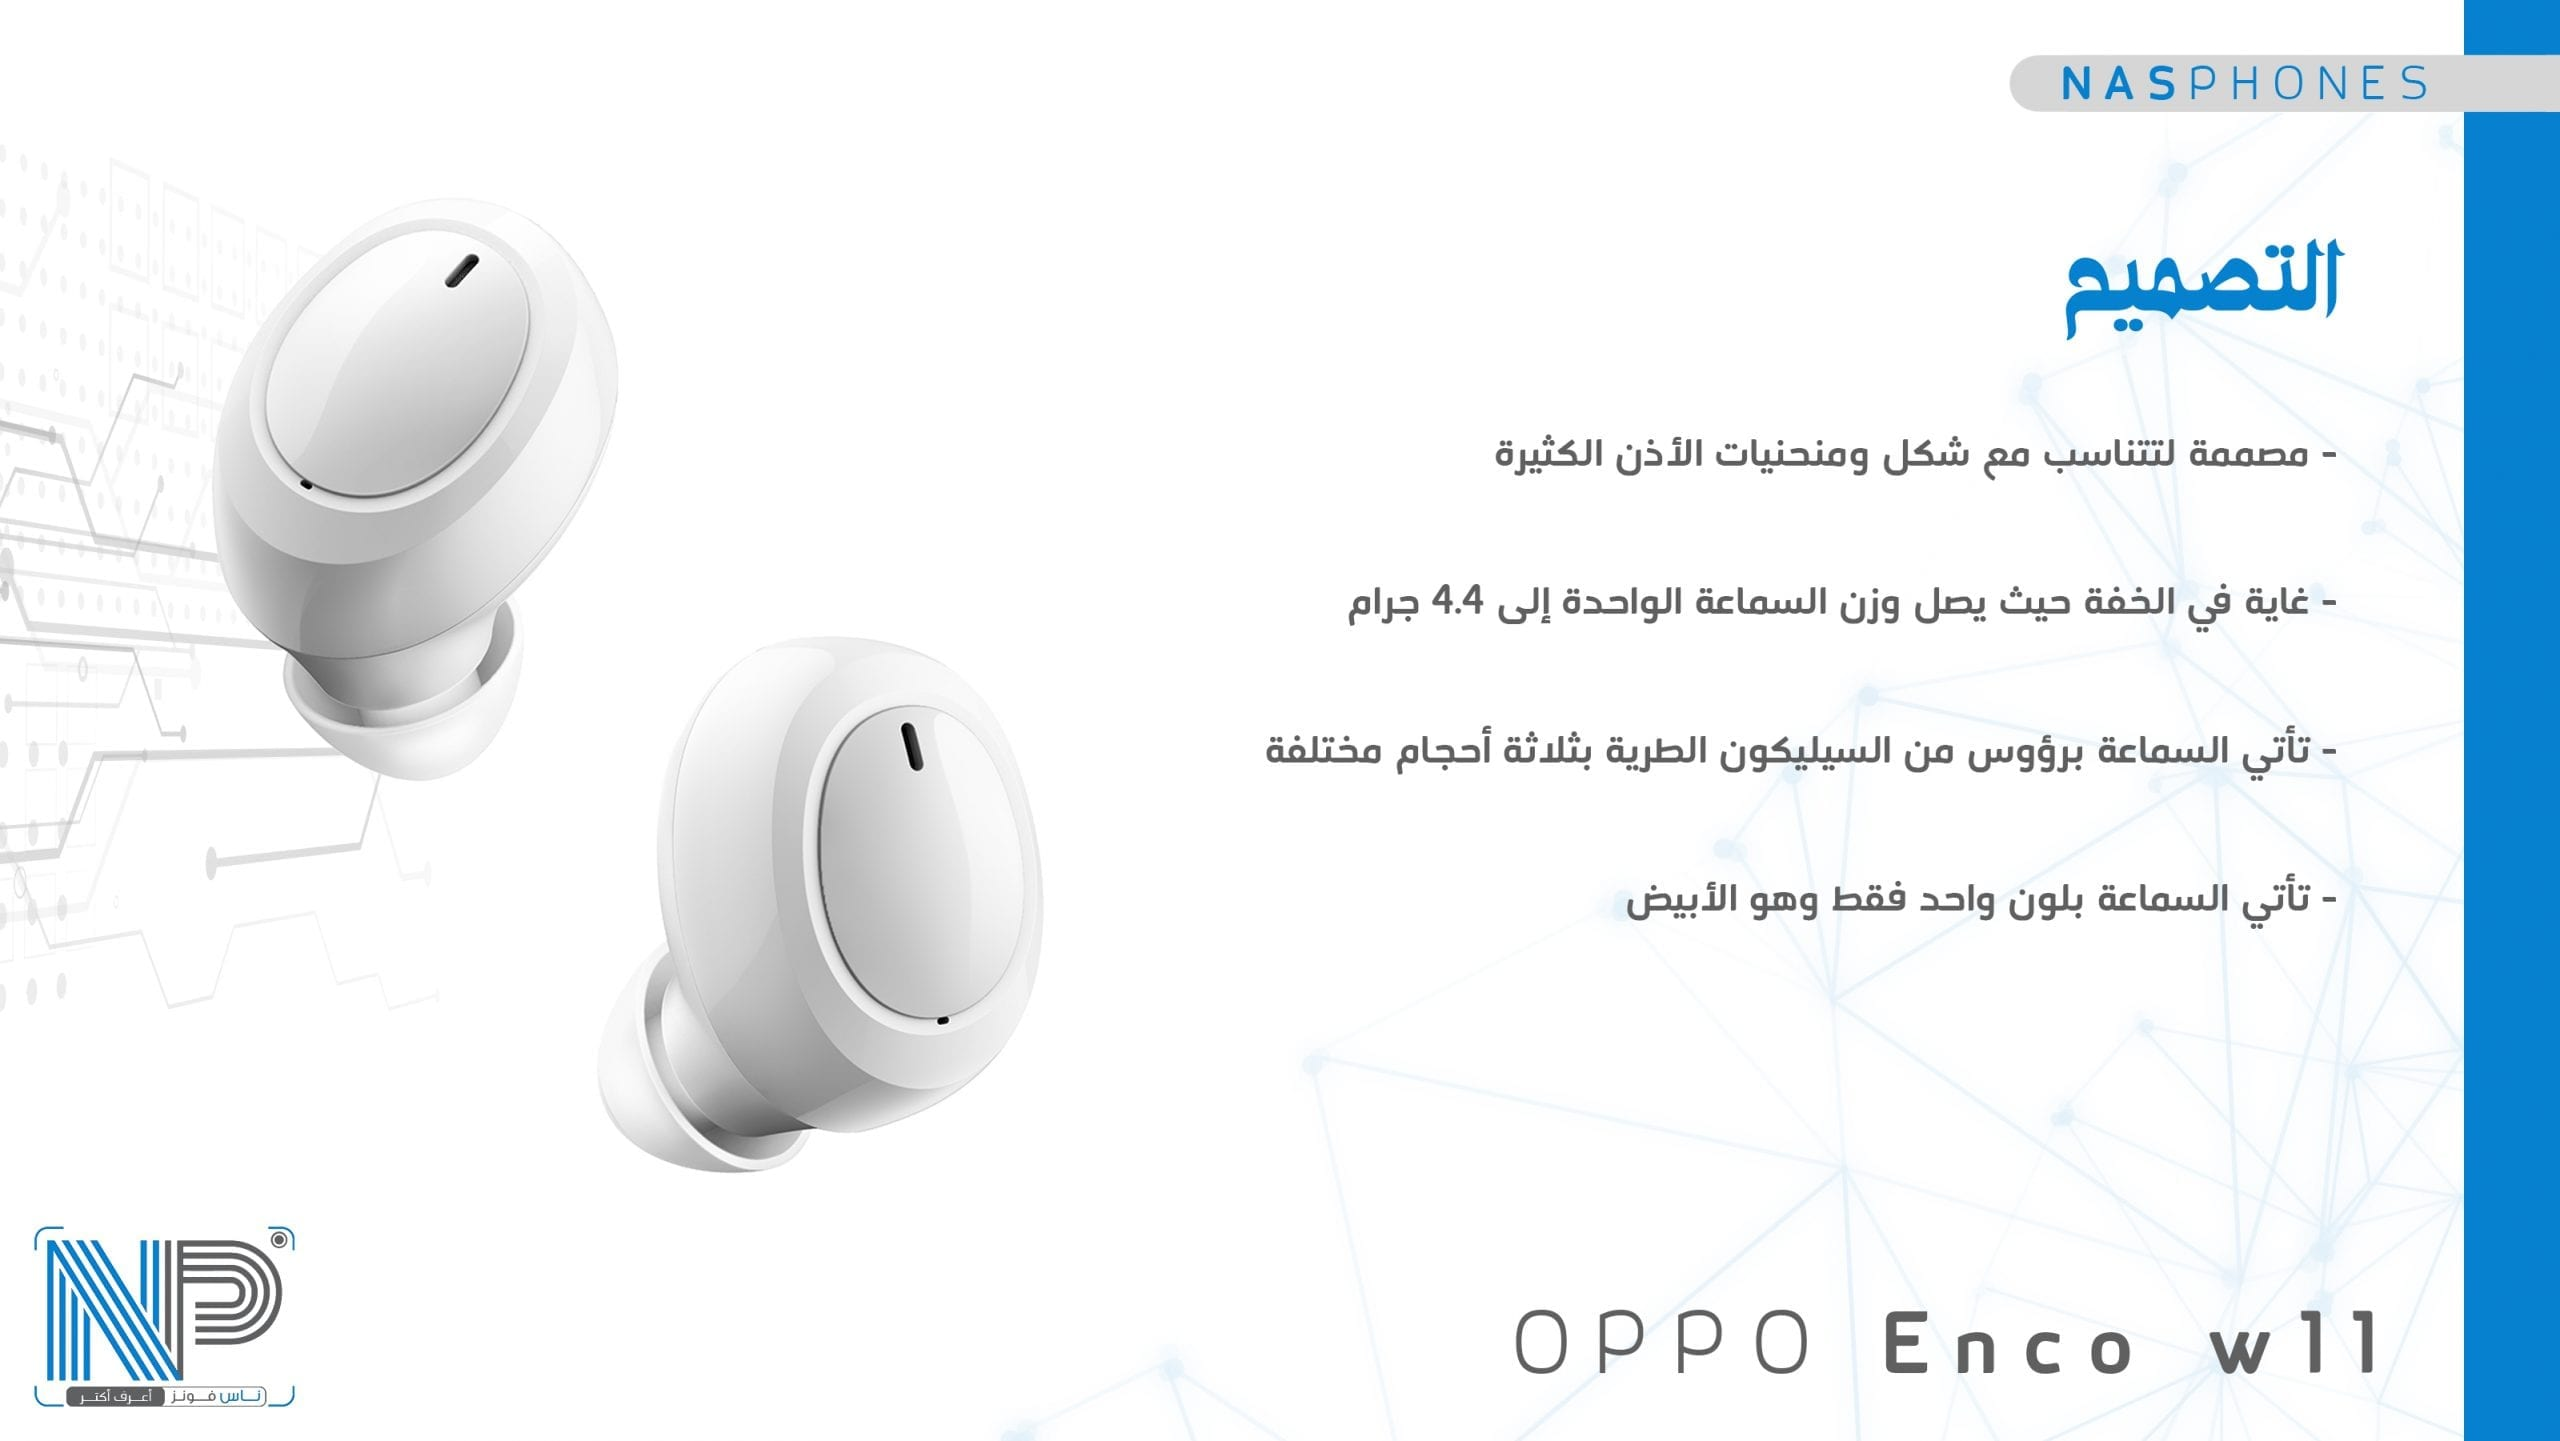 تصميم Oppo Enco w11